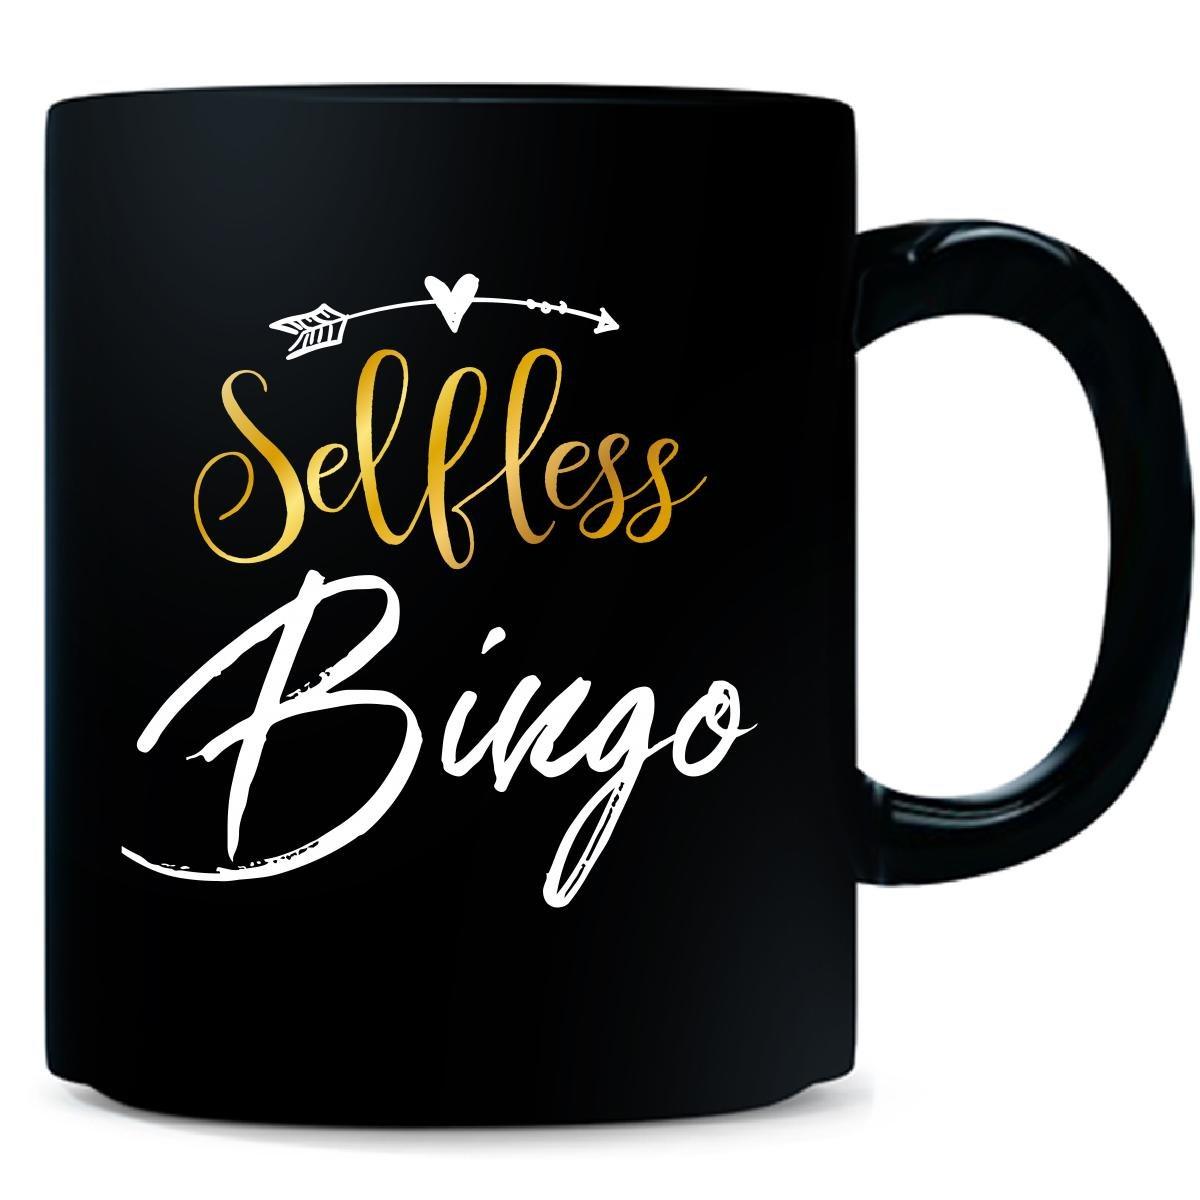 Selfless Bingo Name Mothers Day Present Grandma - Mug